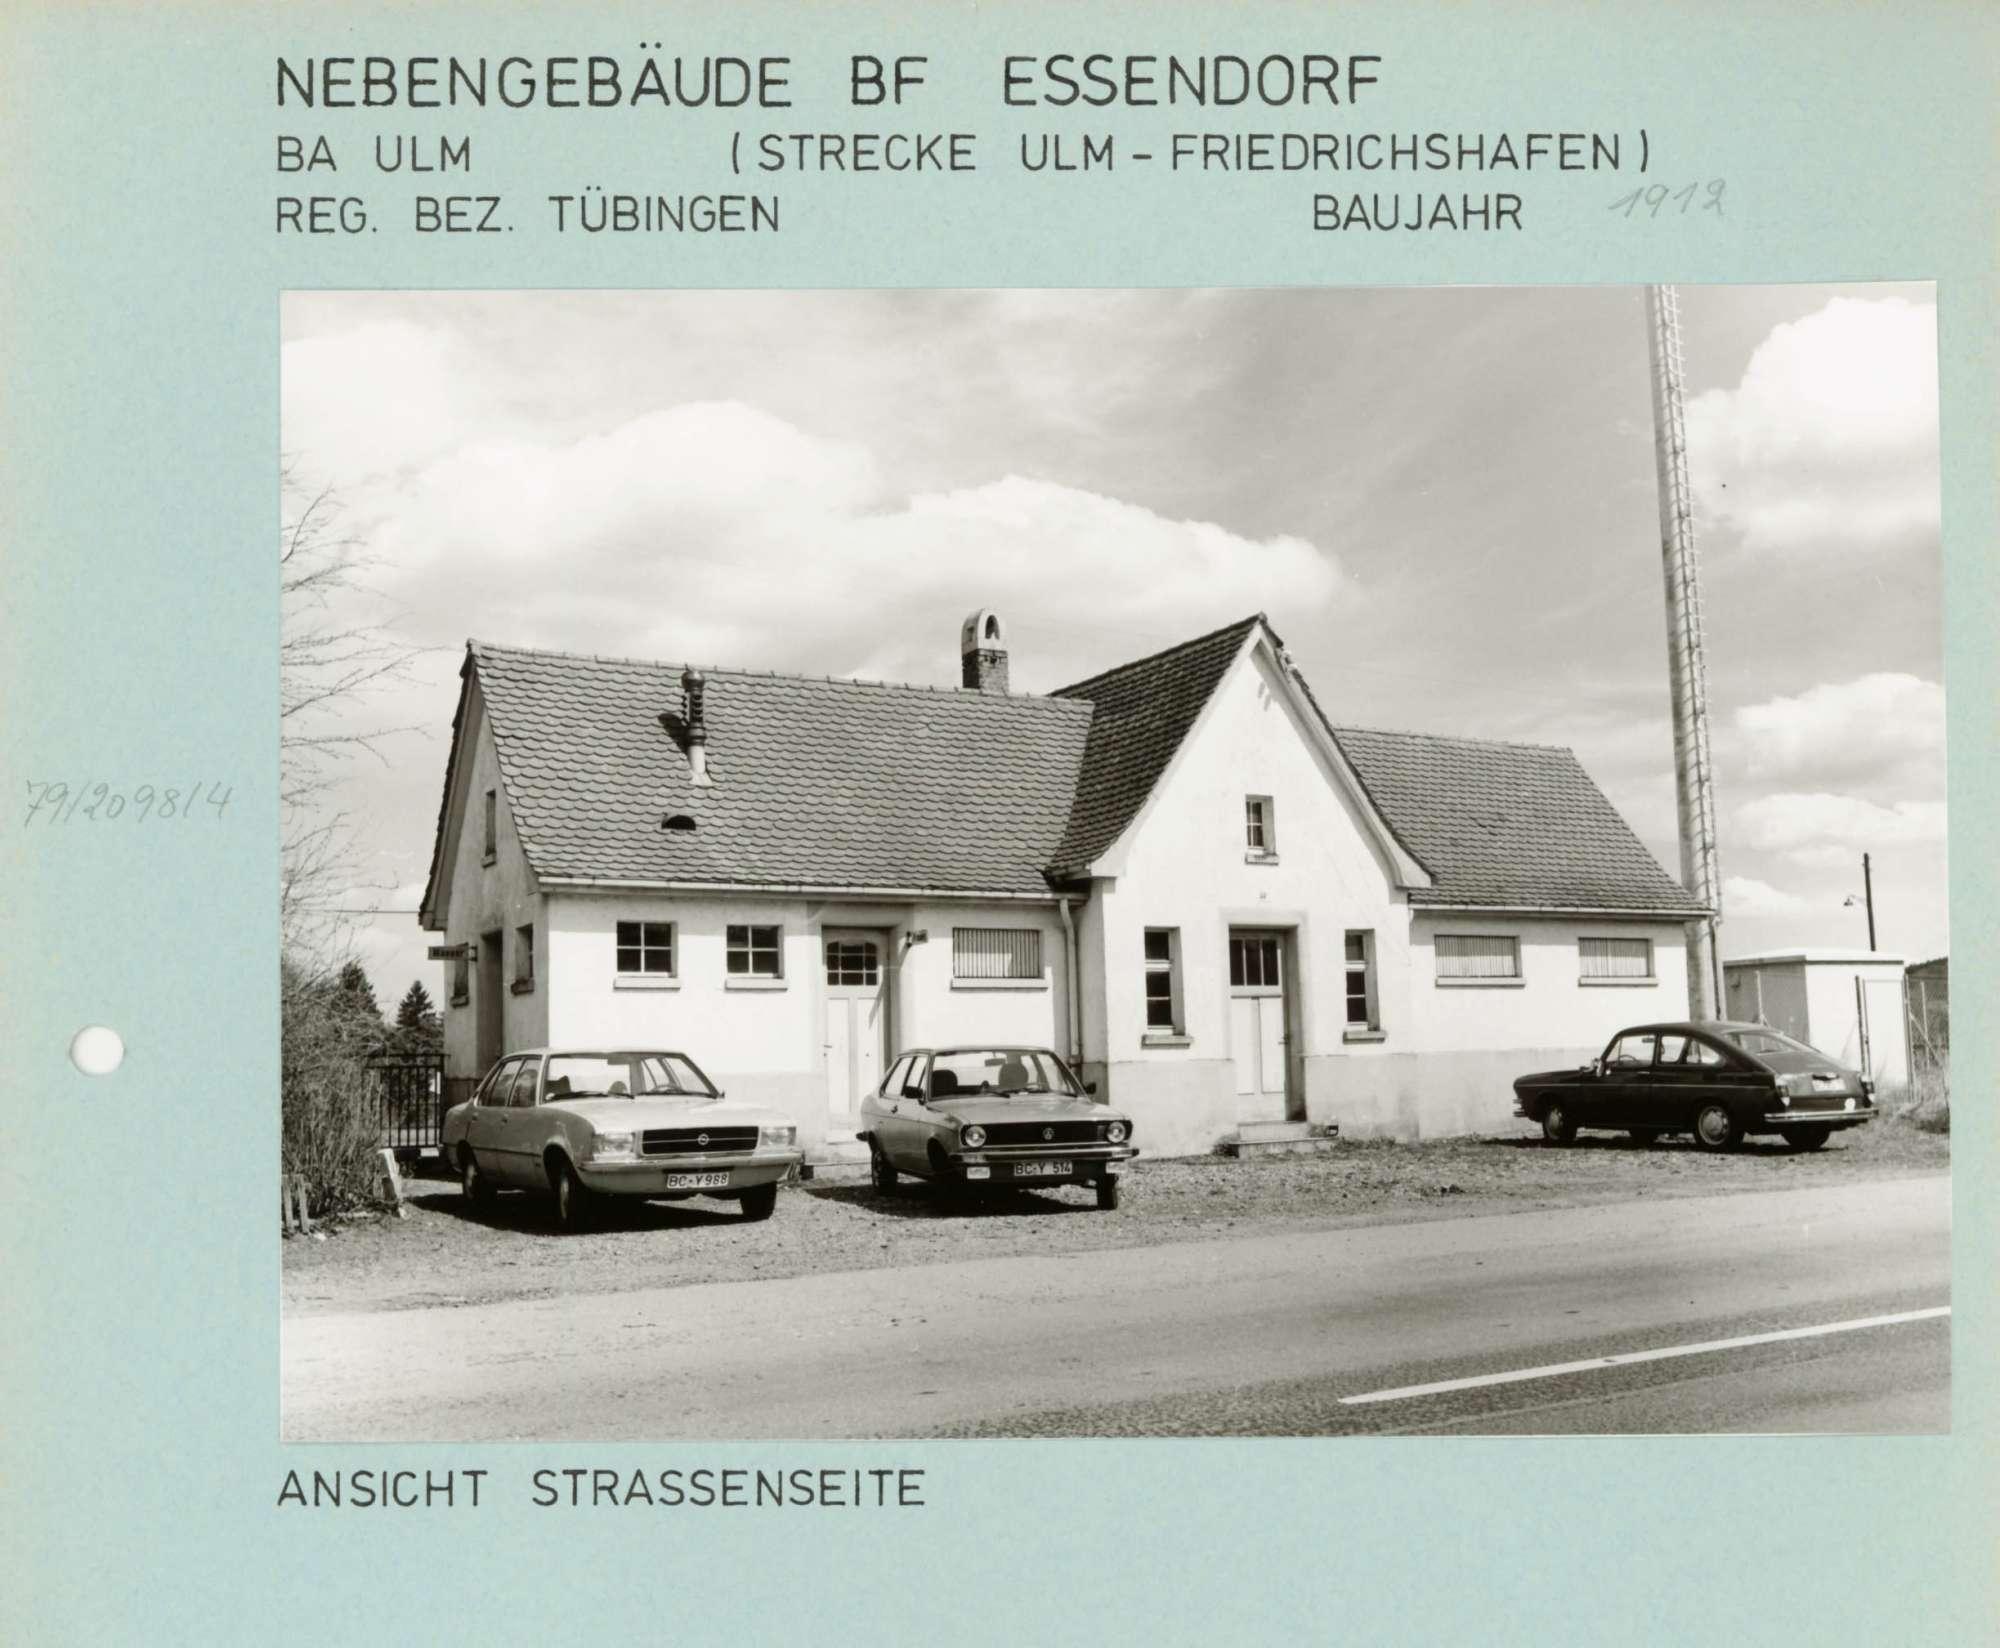 Essendorf: 8 Fotos, Bild 1